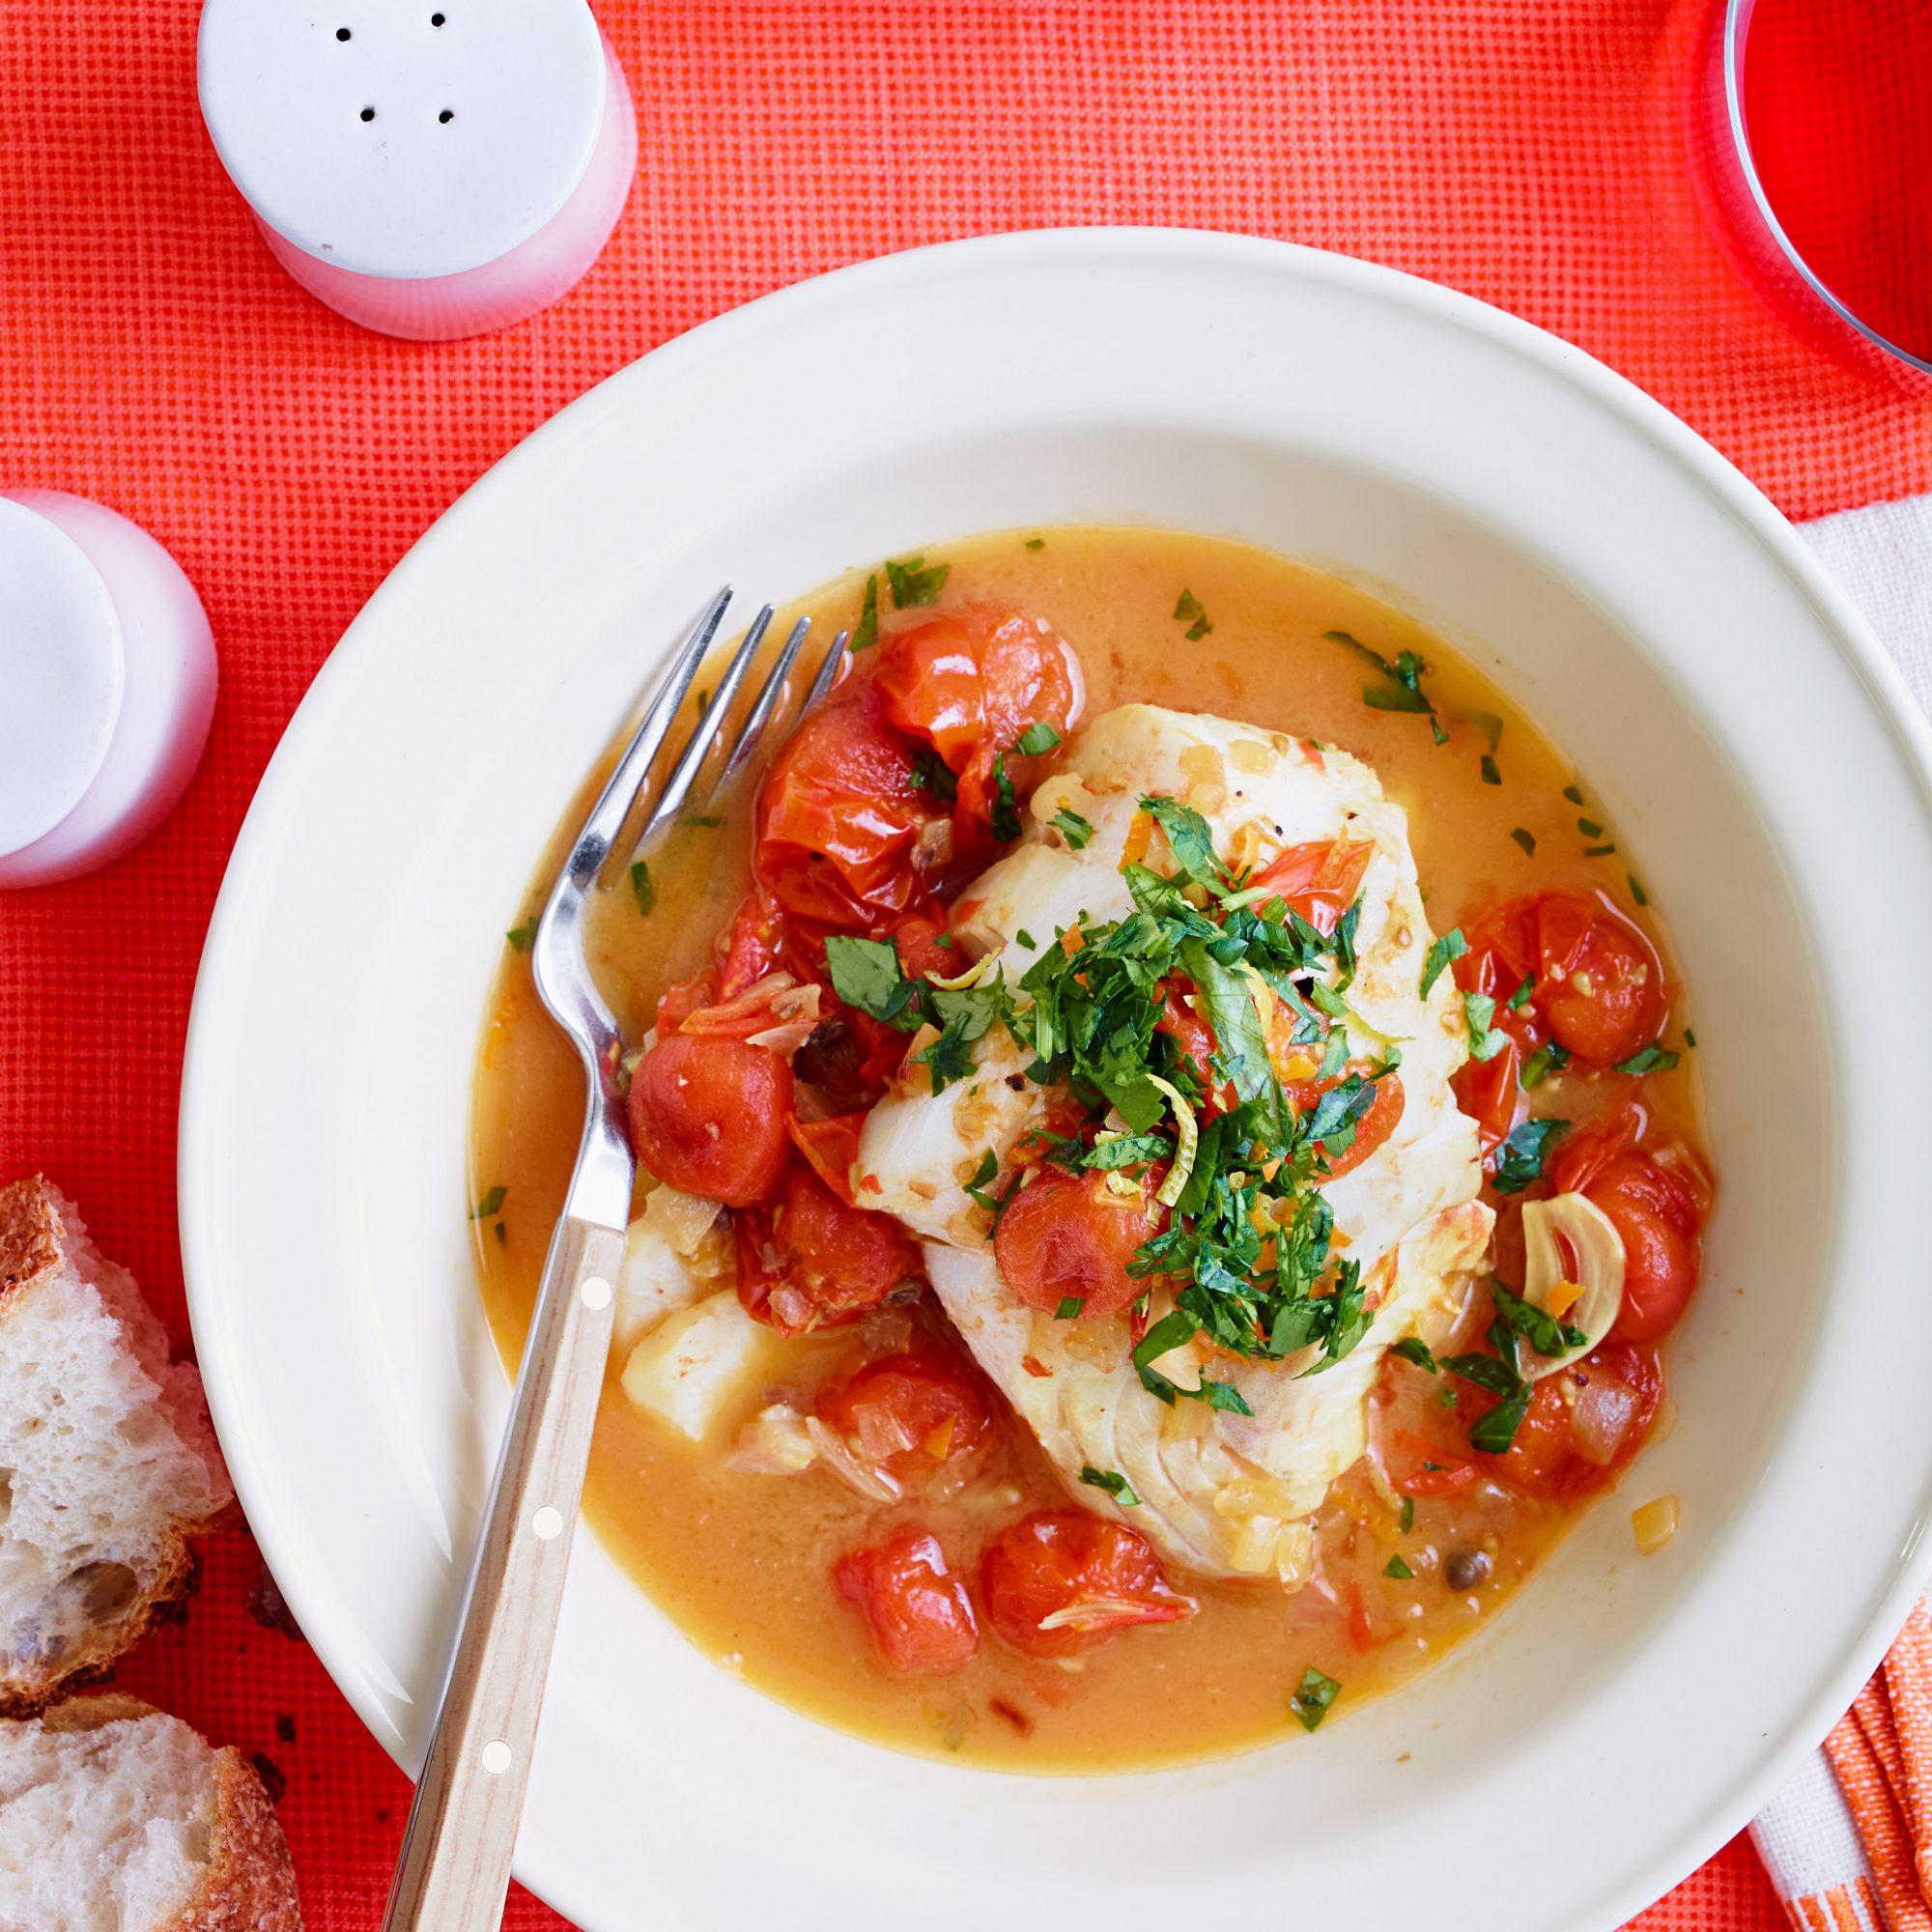 Sicilian-Style Saffron Cod with Burst Tomatoes